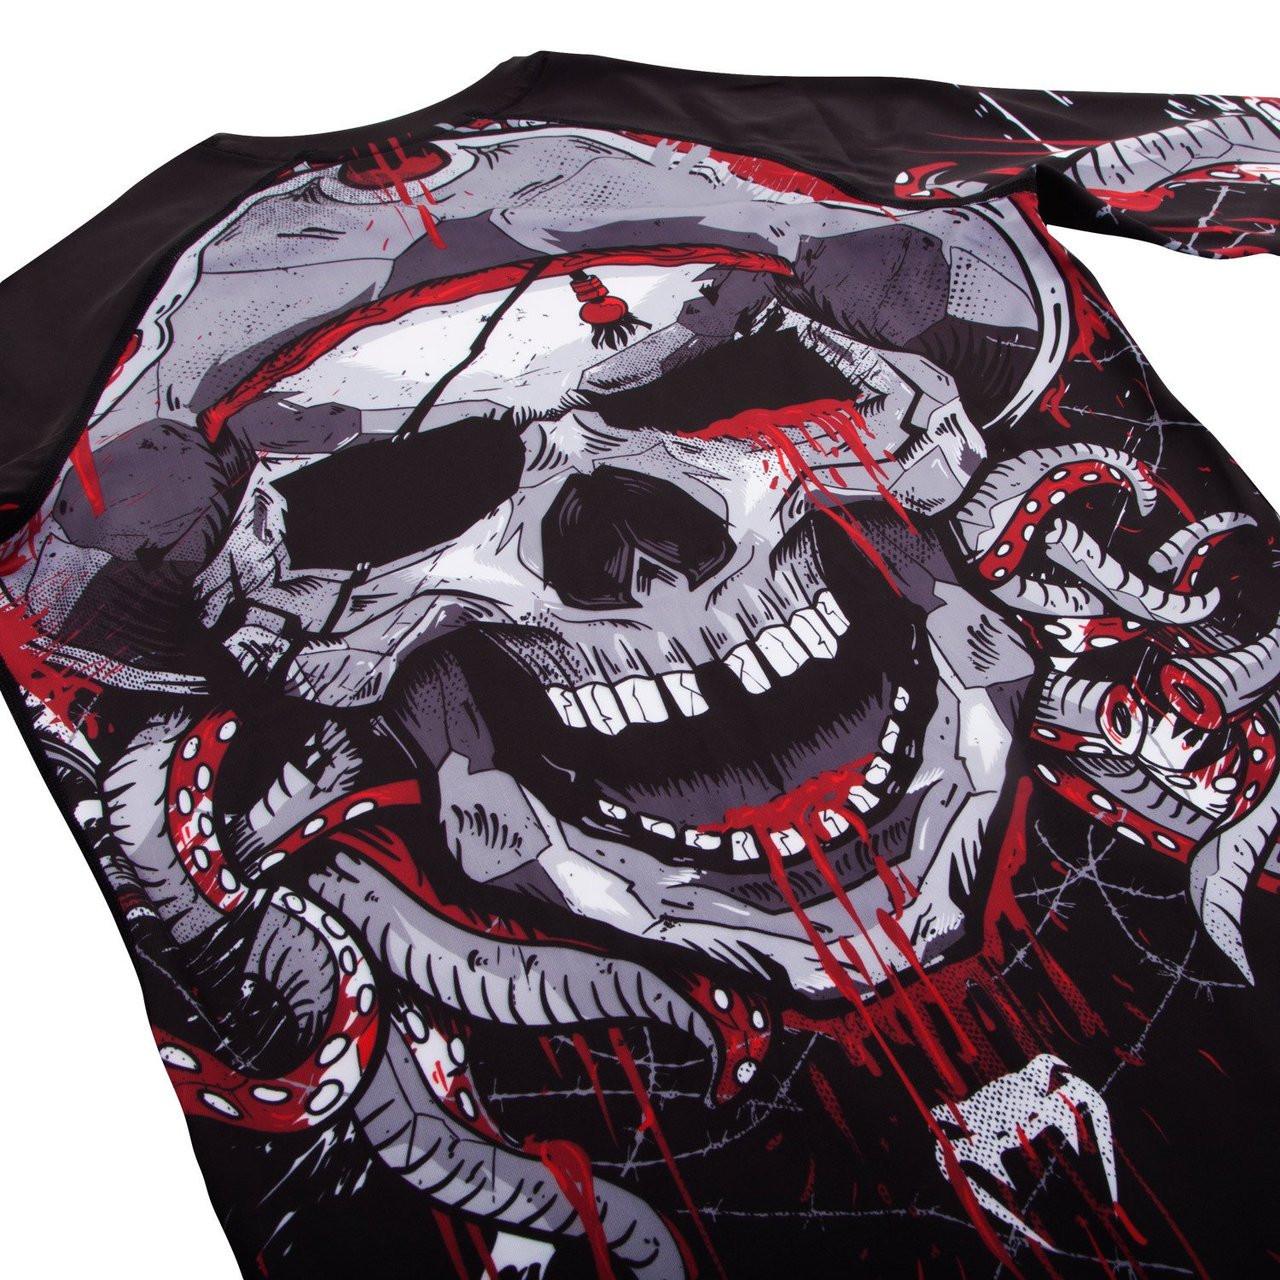 Venum pirate 3.0 rashguard black/red Longsleeve available at www.thejiujitsushop.com  Enjoy Free shipping from The Jiu Jitsu Shop today!